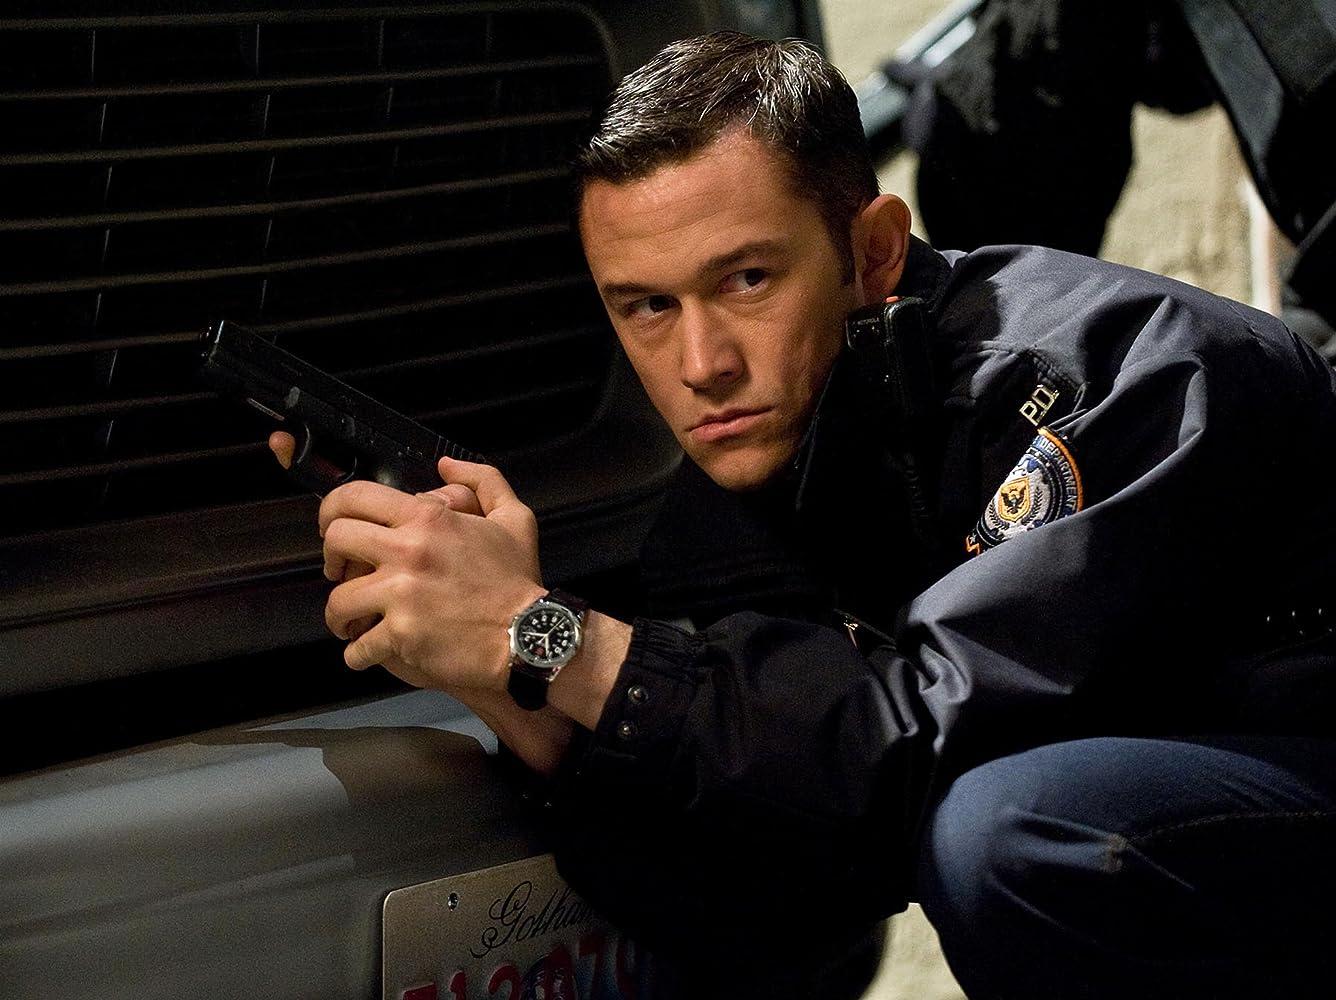 Joseph Gordon-Levitt in The Dark Knight Rises (2012)